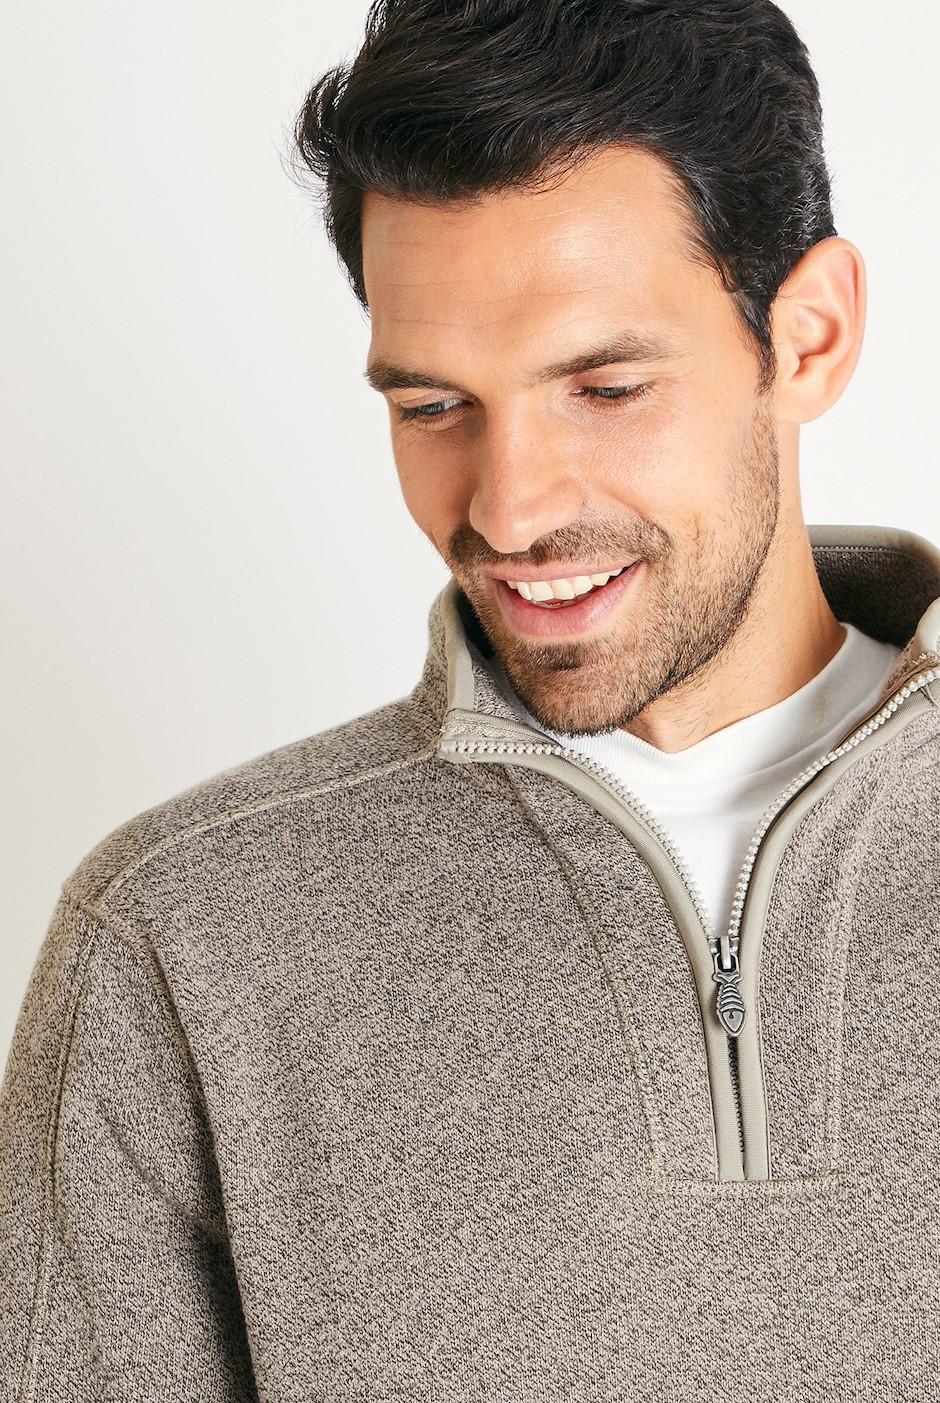 Stowe 1/4 Zip Soft Knit Fleece  Taupe Grey